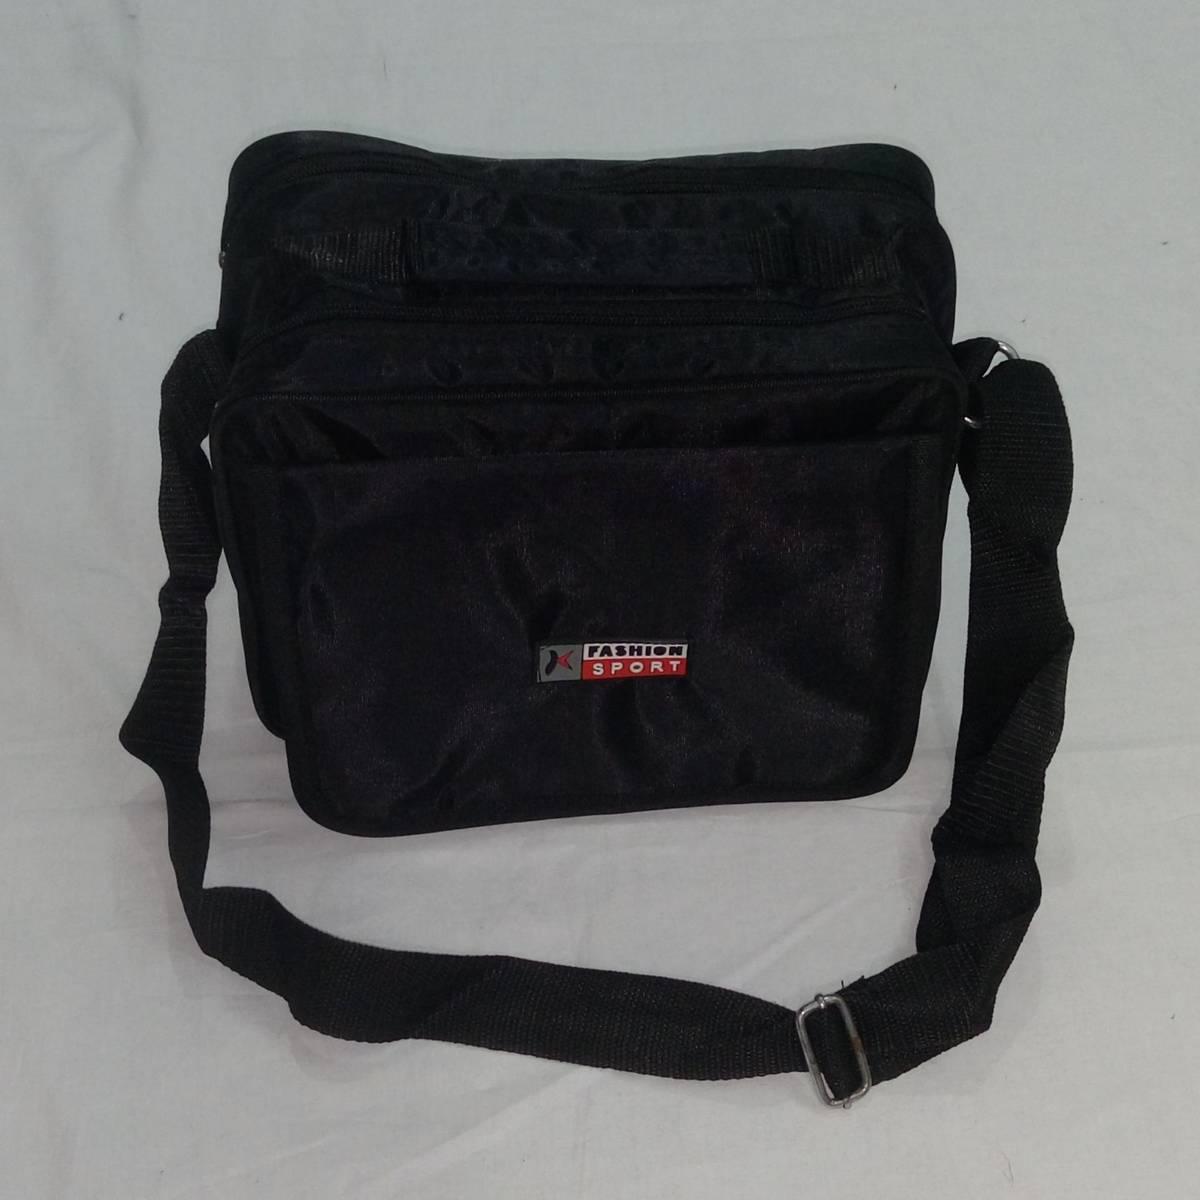 Travel handbag for Hajj and Umrah